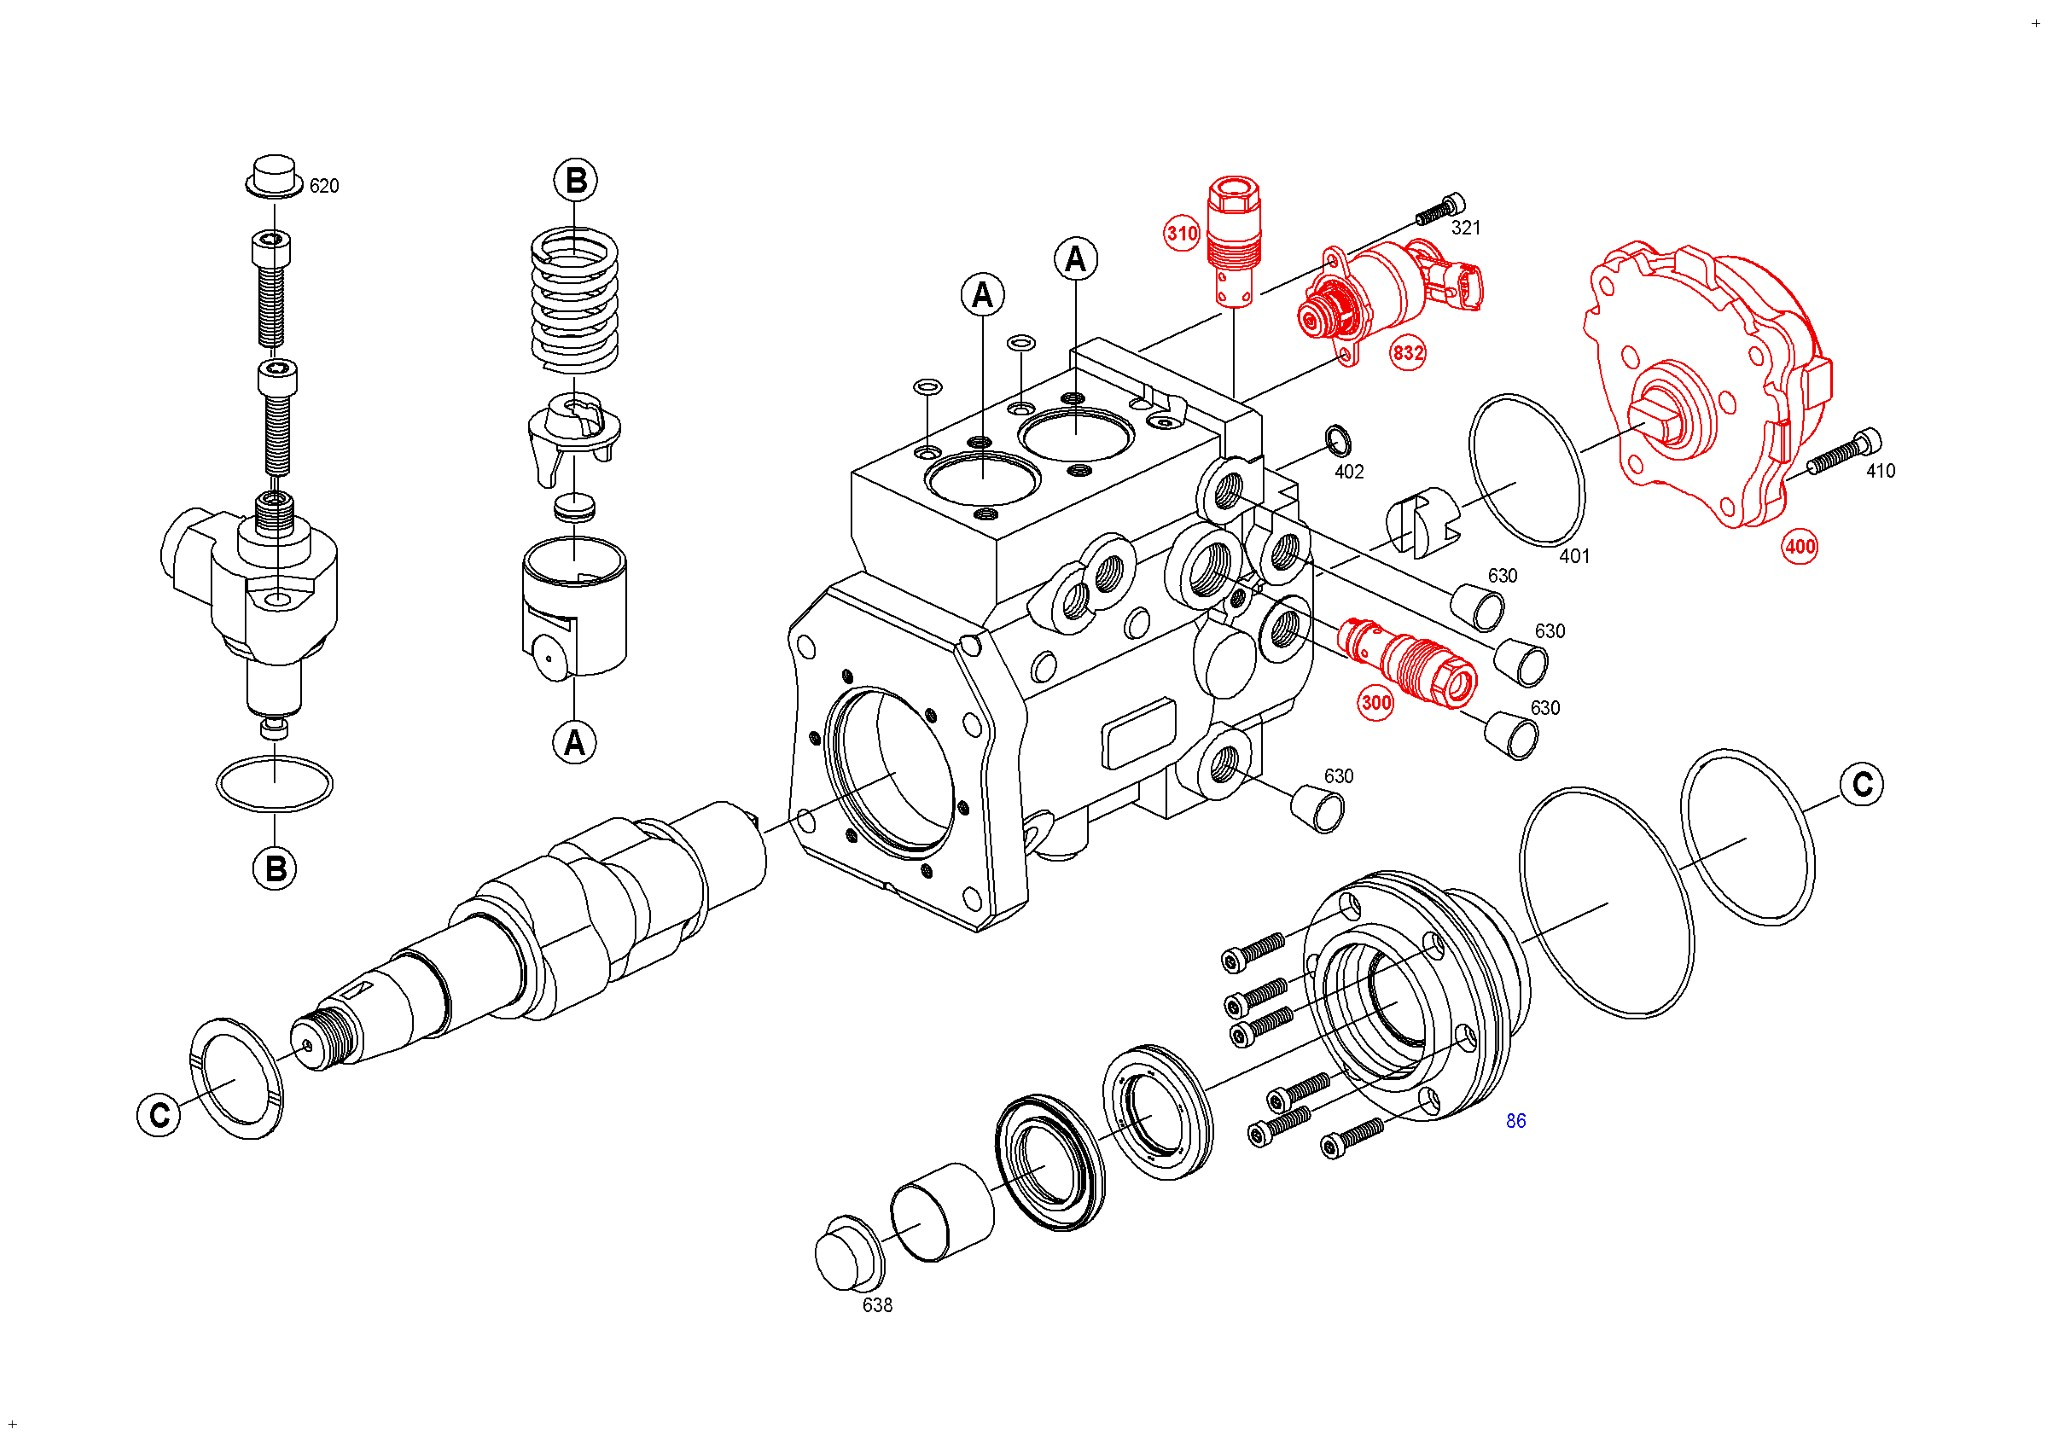 Suzuki Gs 750 Wiring Diagram - Wiring Diagram And Fuse Box